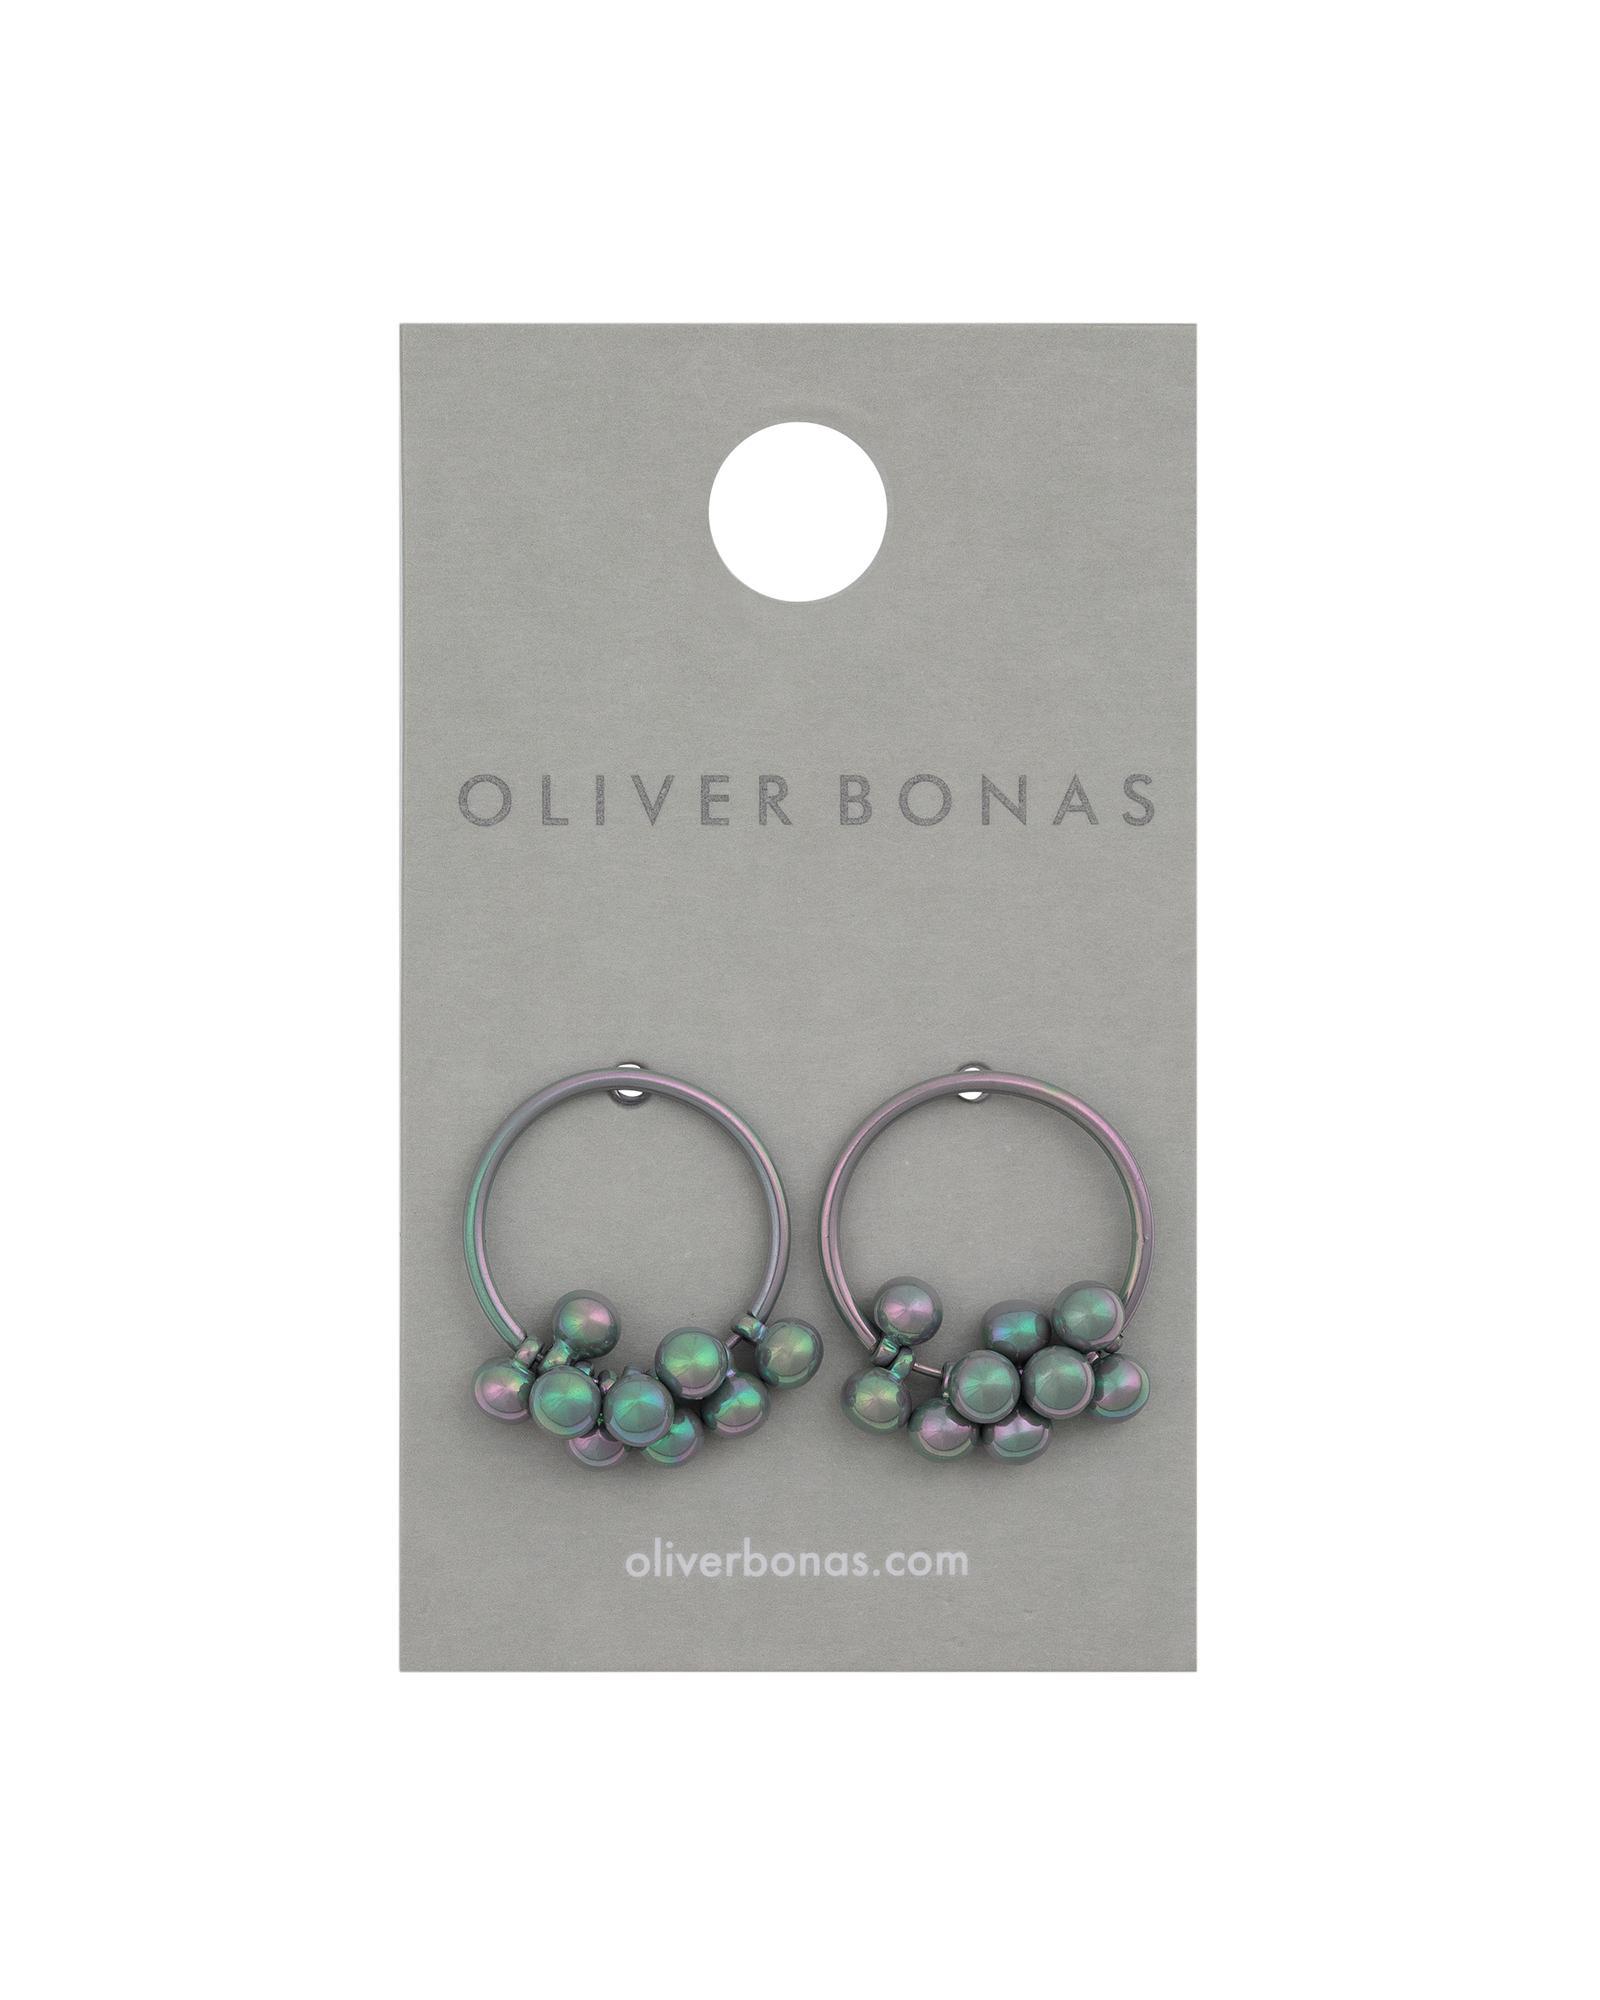 b8e0d275d Oliver Bonas Nima Iridescent Bead & Hoop Earrings - Lyst